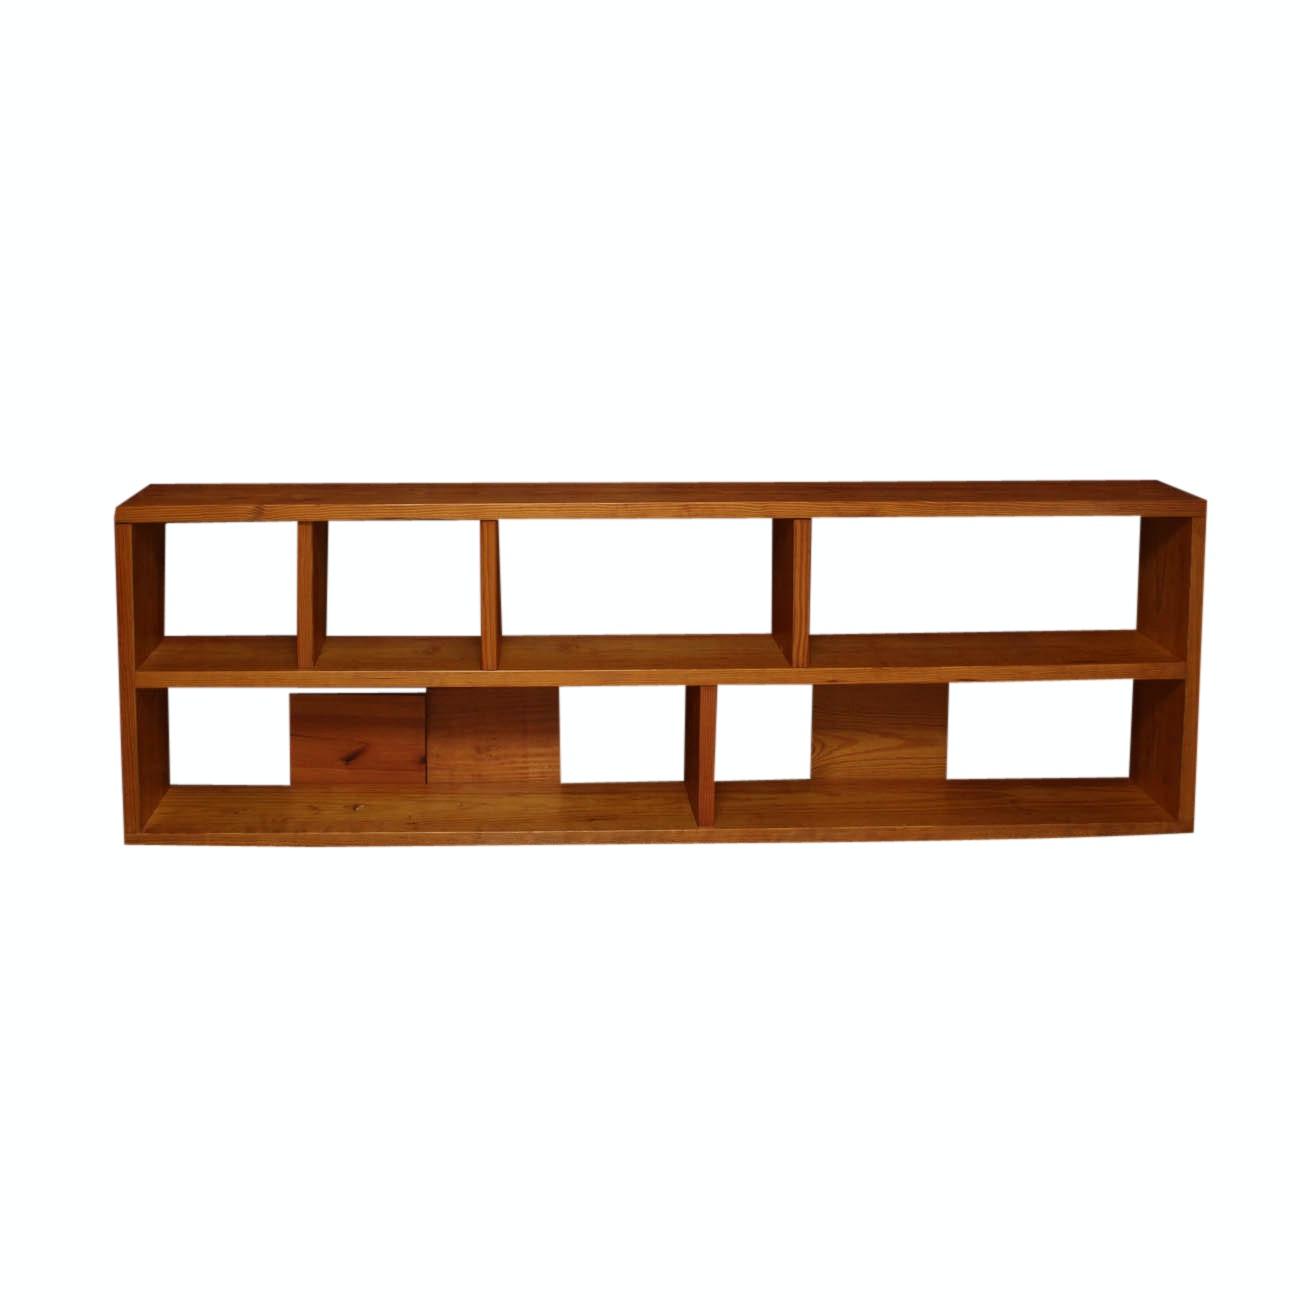 Handmade Modular Wooden Bookcase